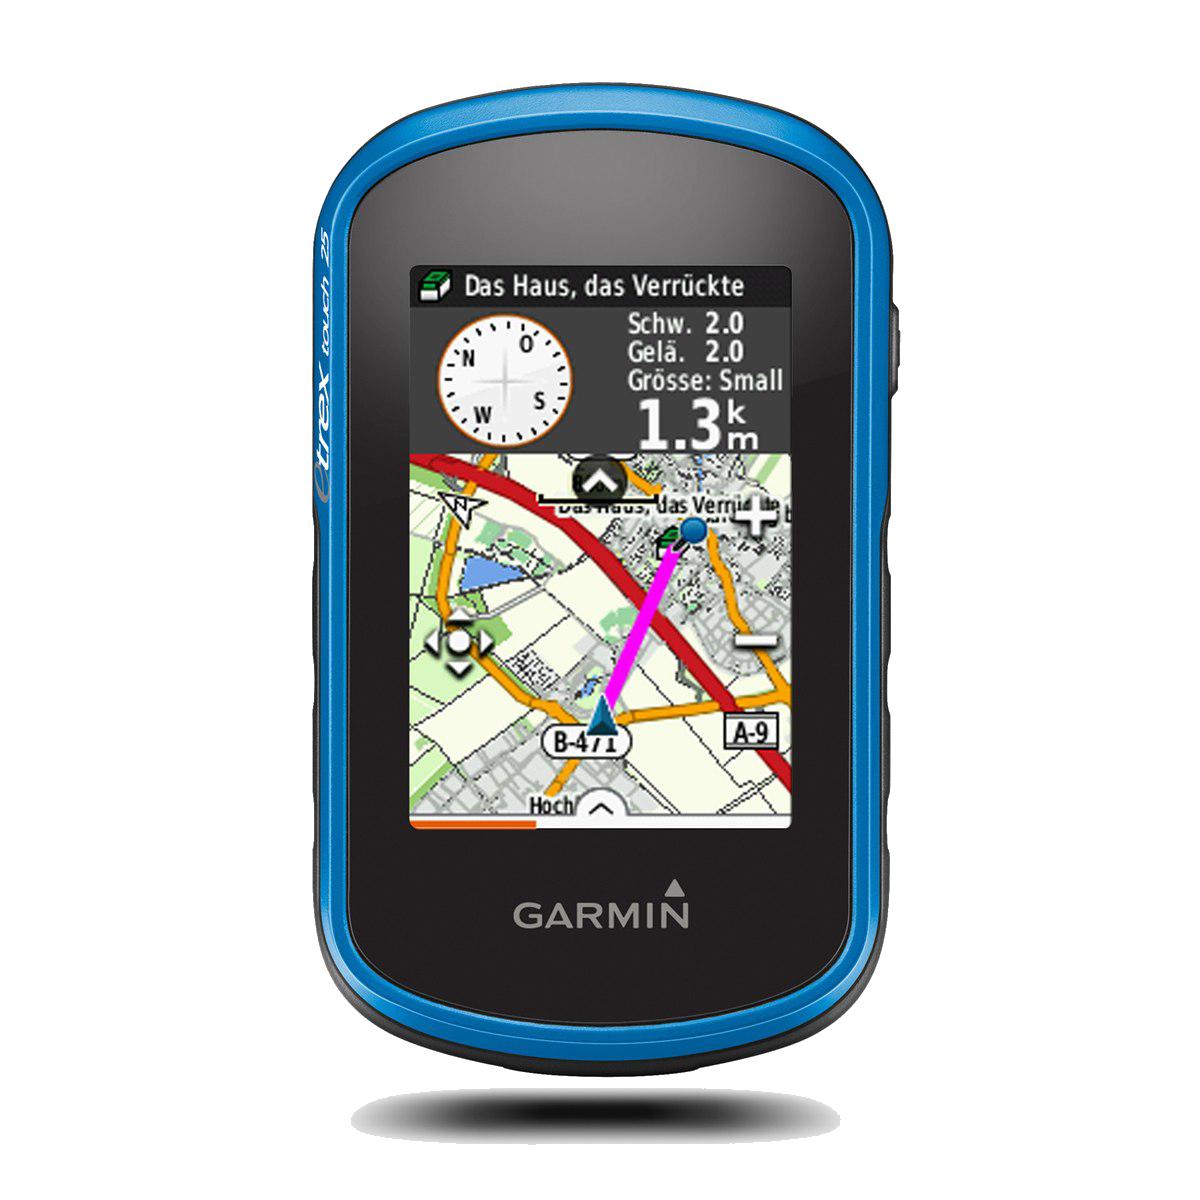 GARMIN HANDHELD GPS eTrex 25x